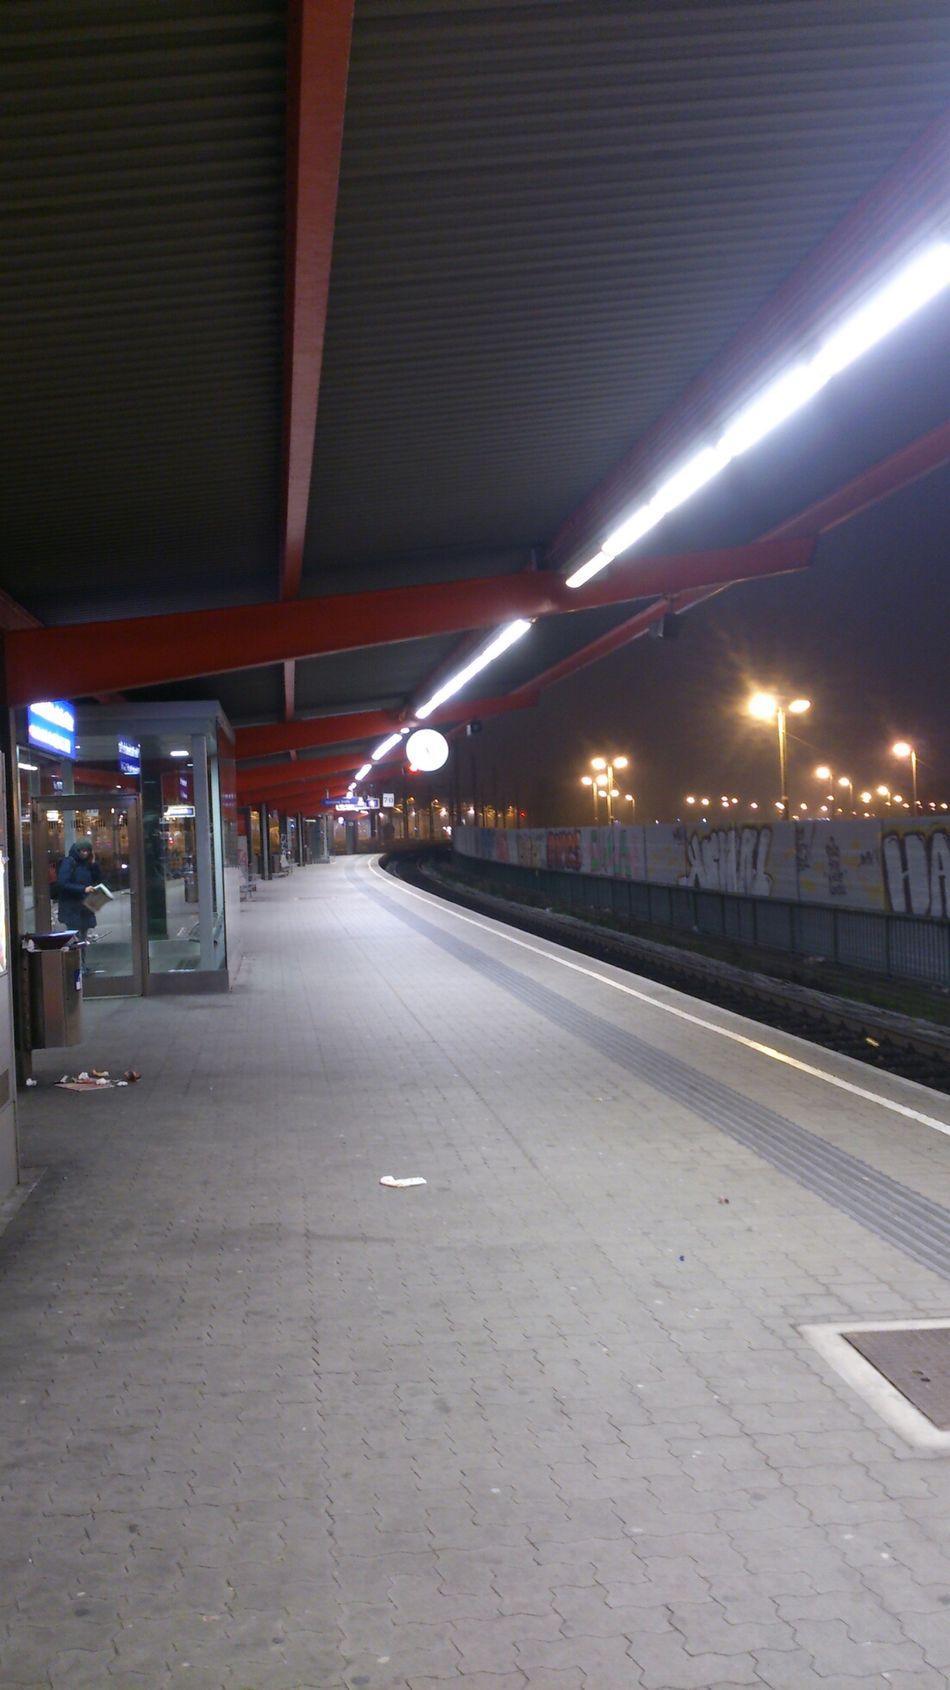 öbb Bahnhof Bahnsteig  Dezember 2013